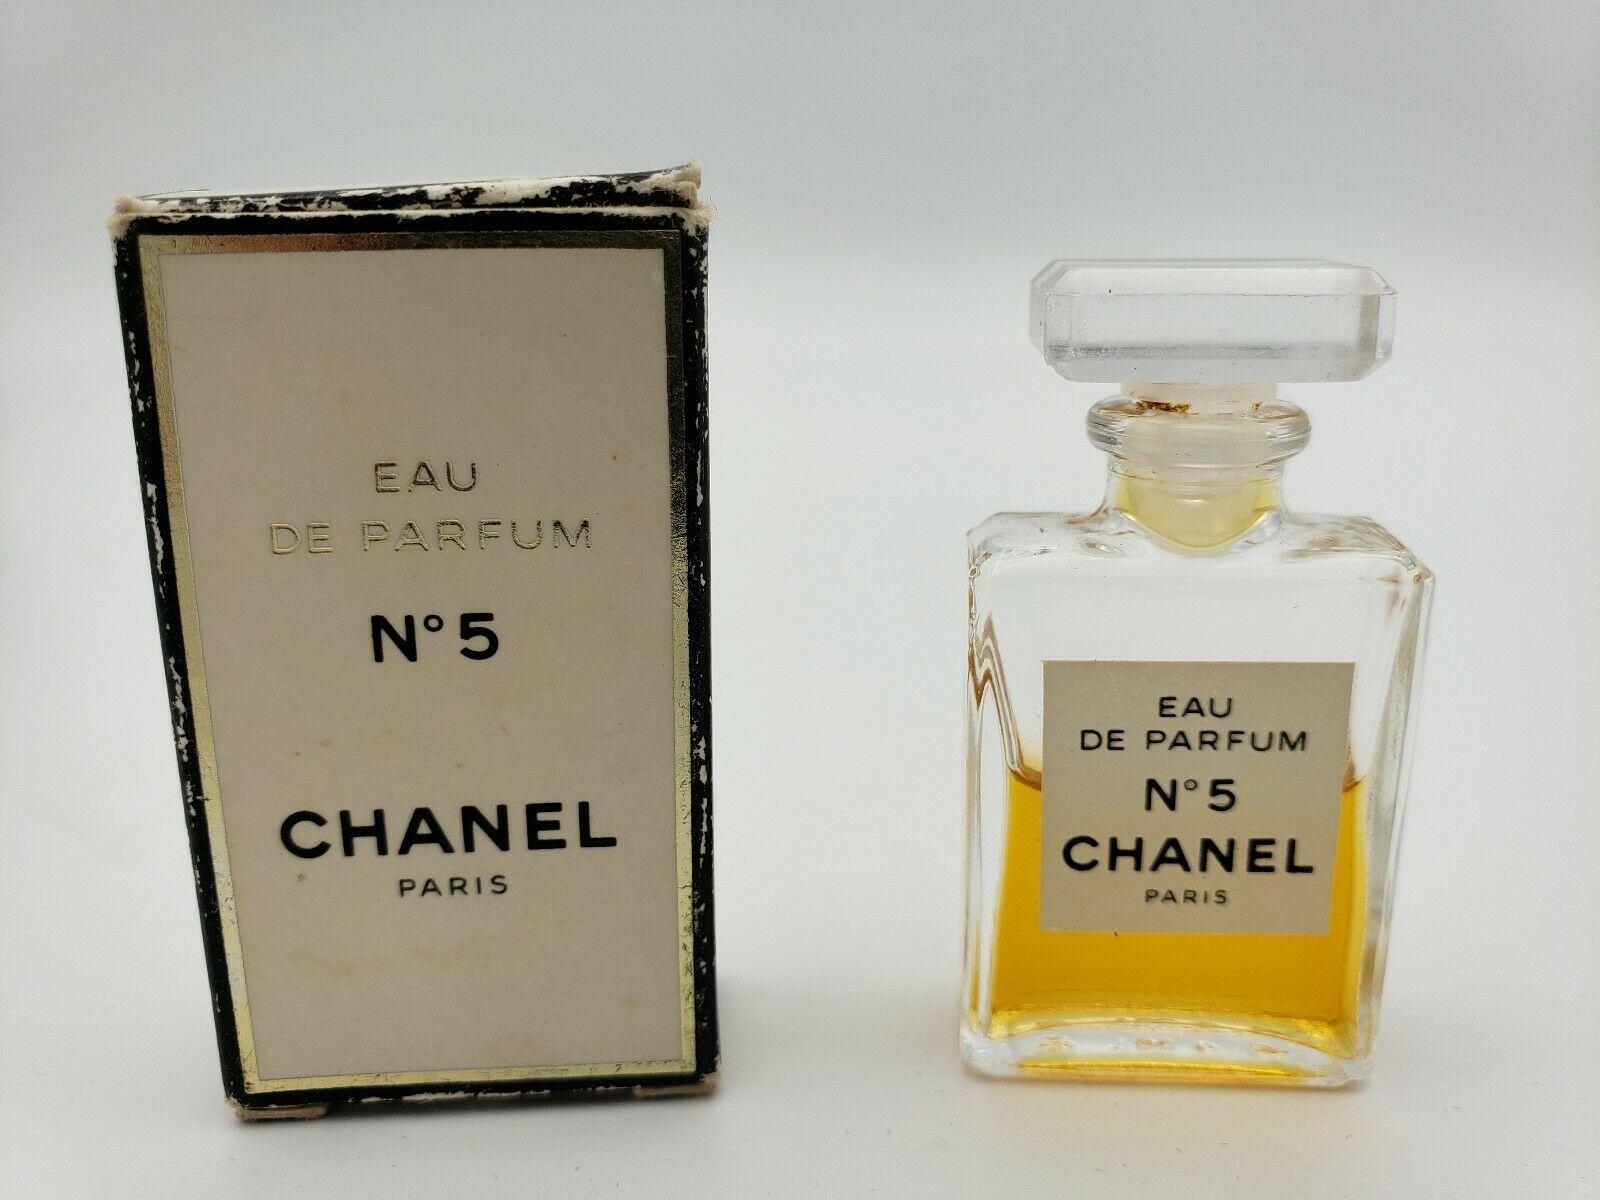 CHANEL NO. 5 Mini Miniature Eau de Parfum 60% Full Perfume .13 Oz w/ Box Vintage